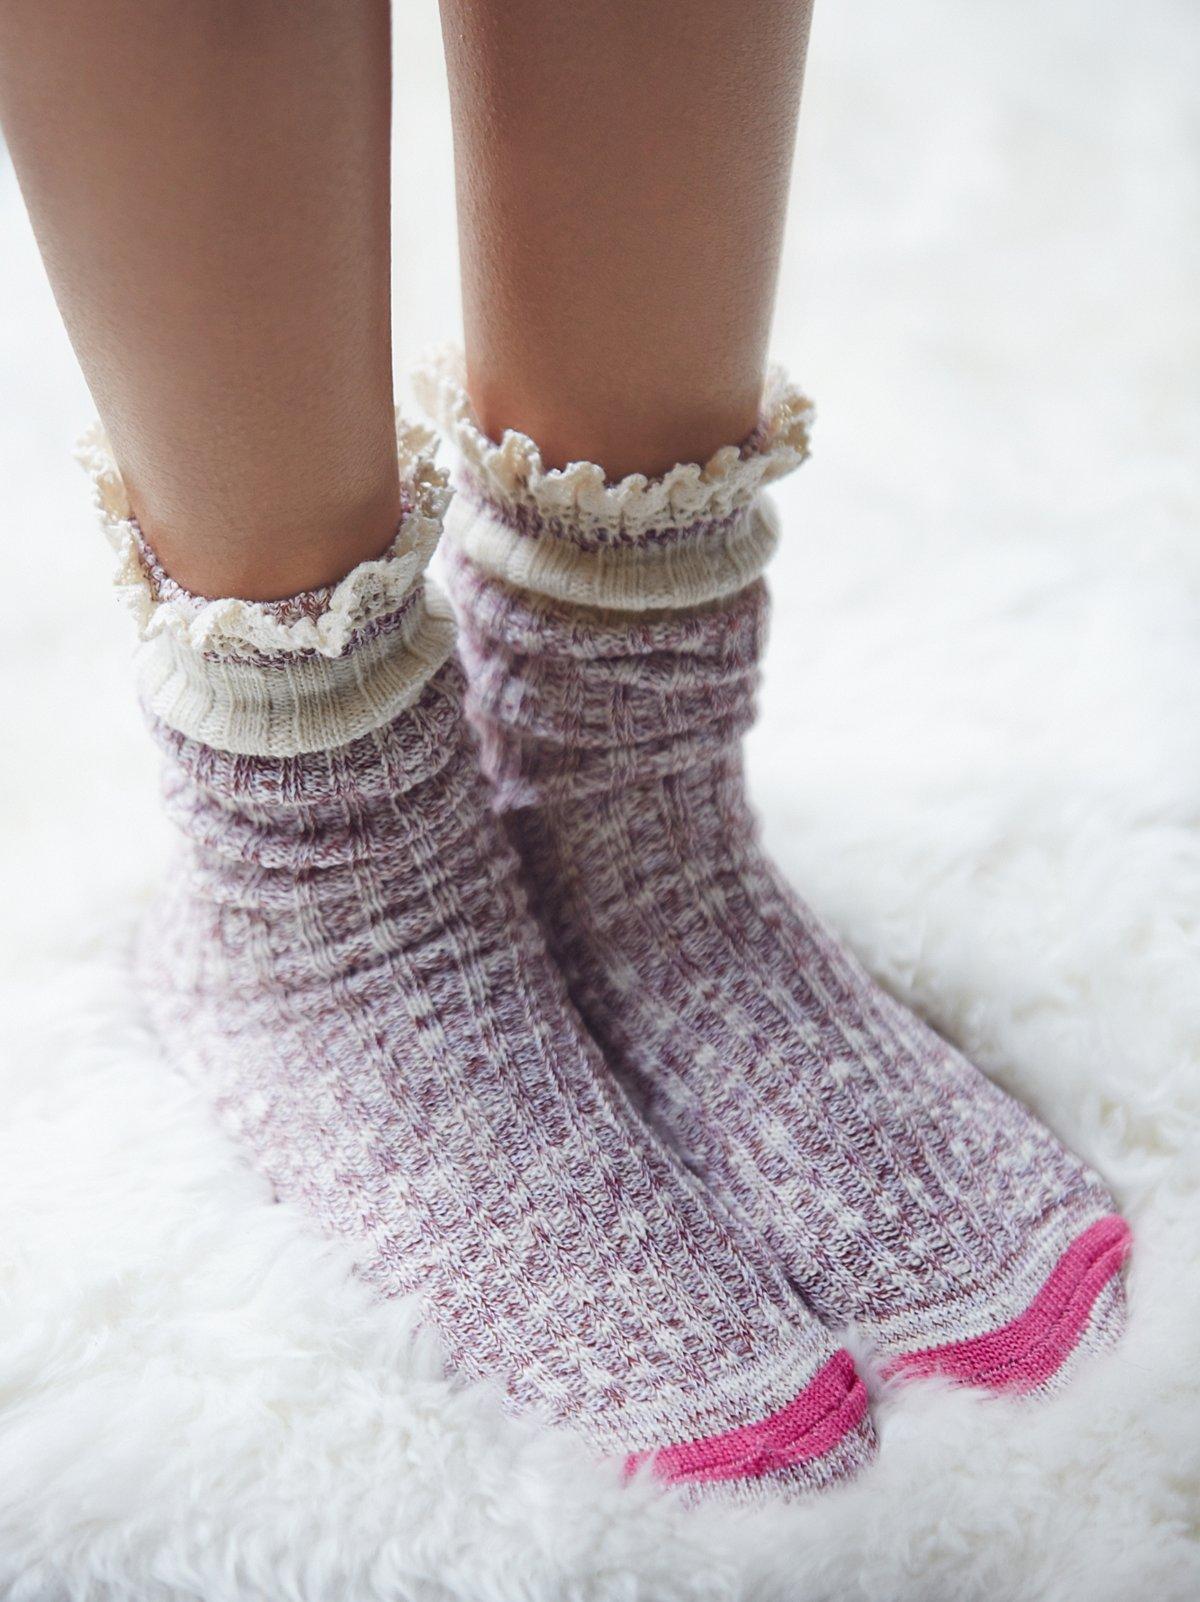 Hiker Highland混色短靴袜